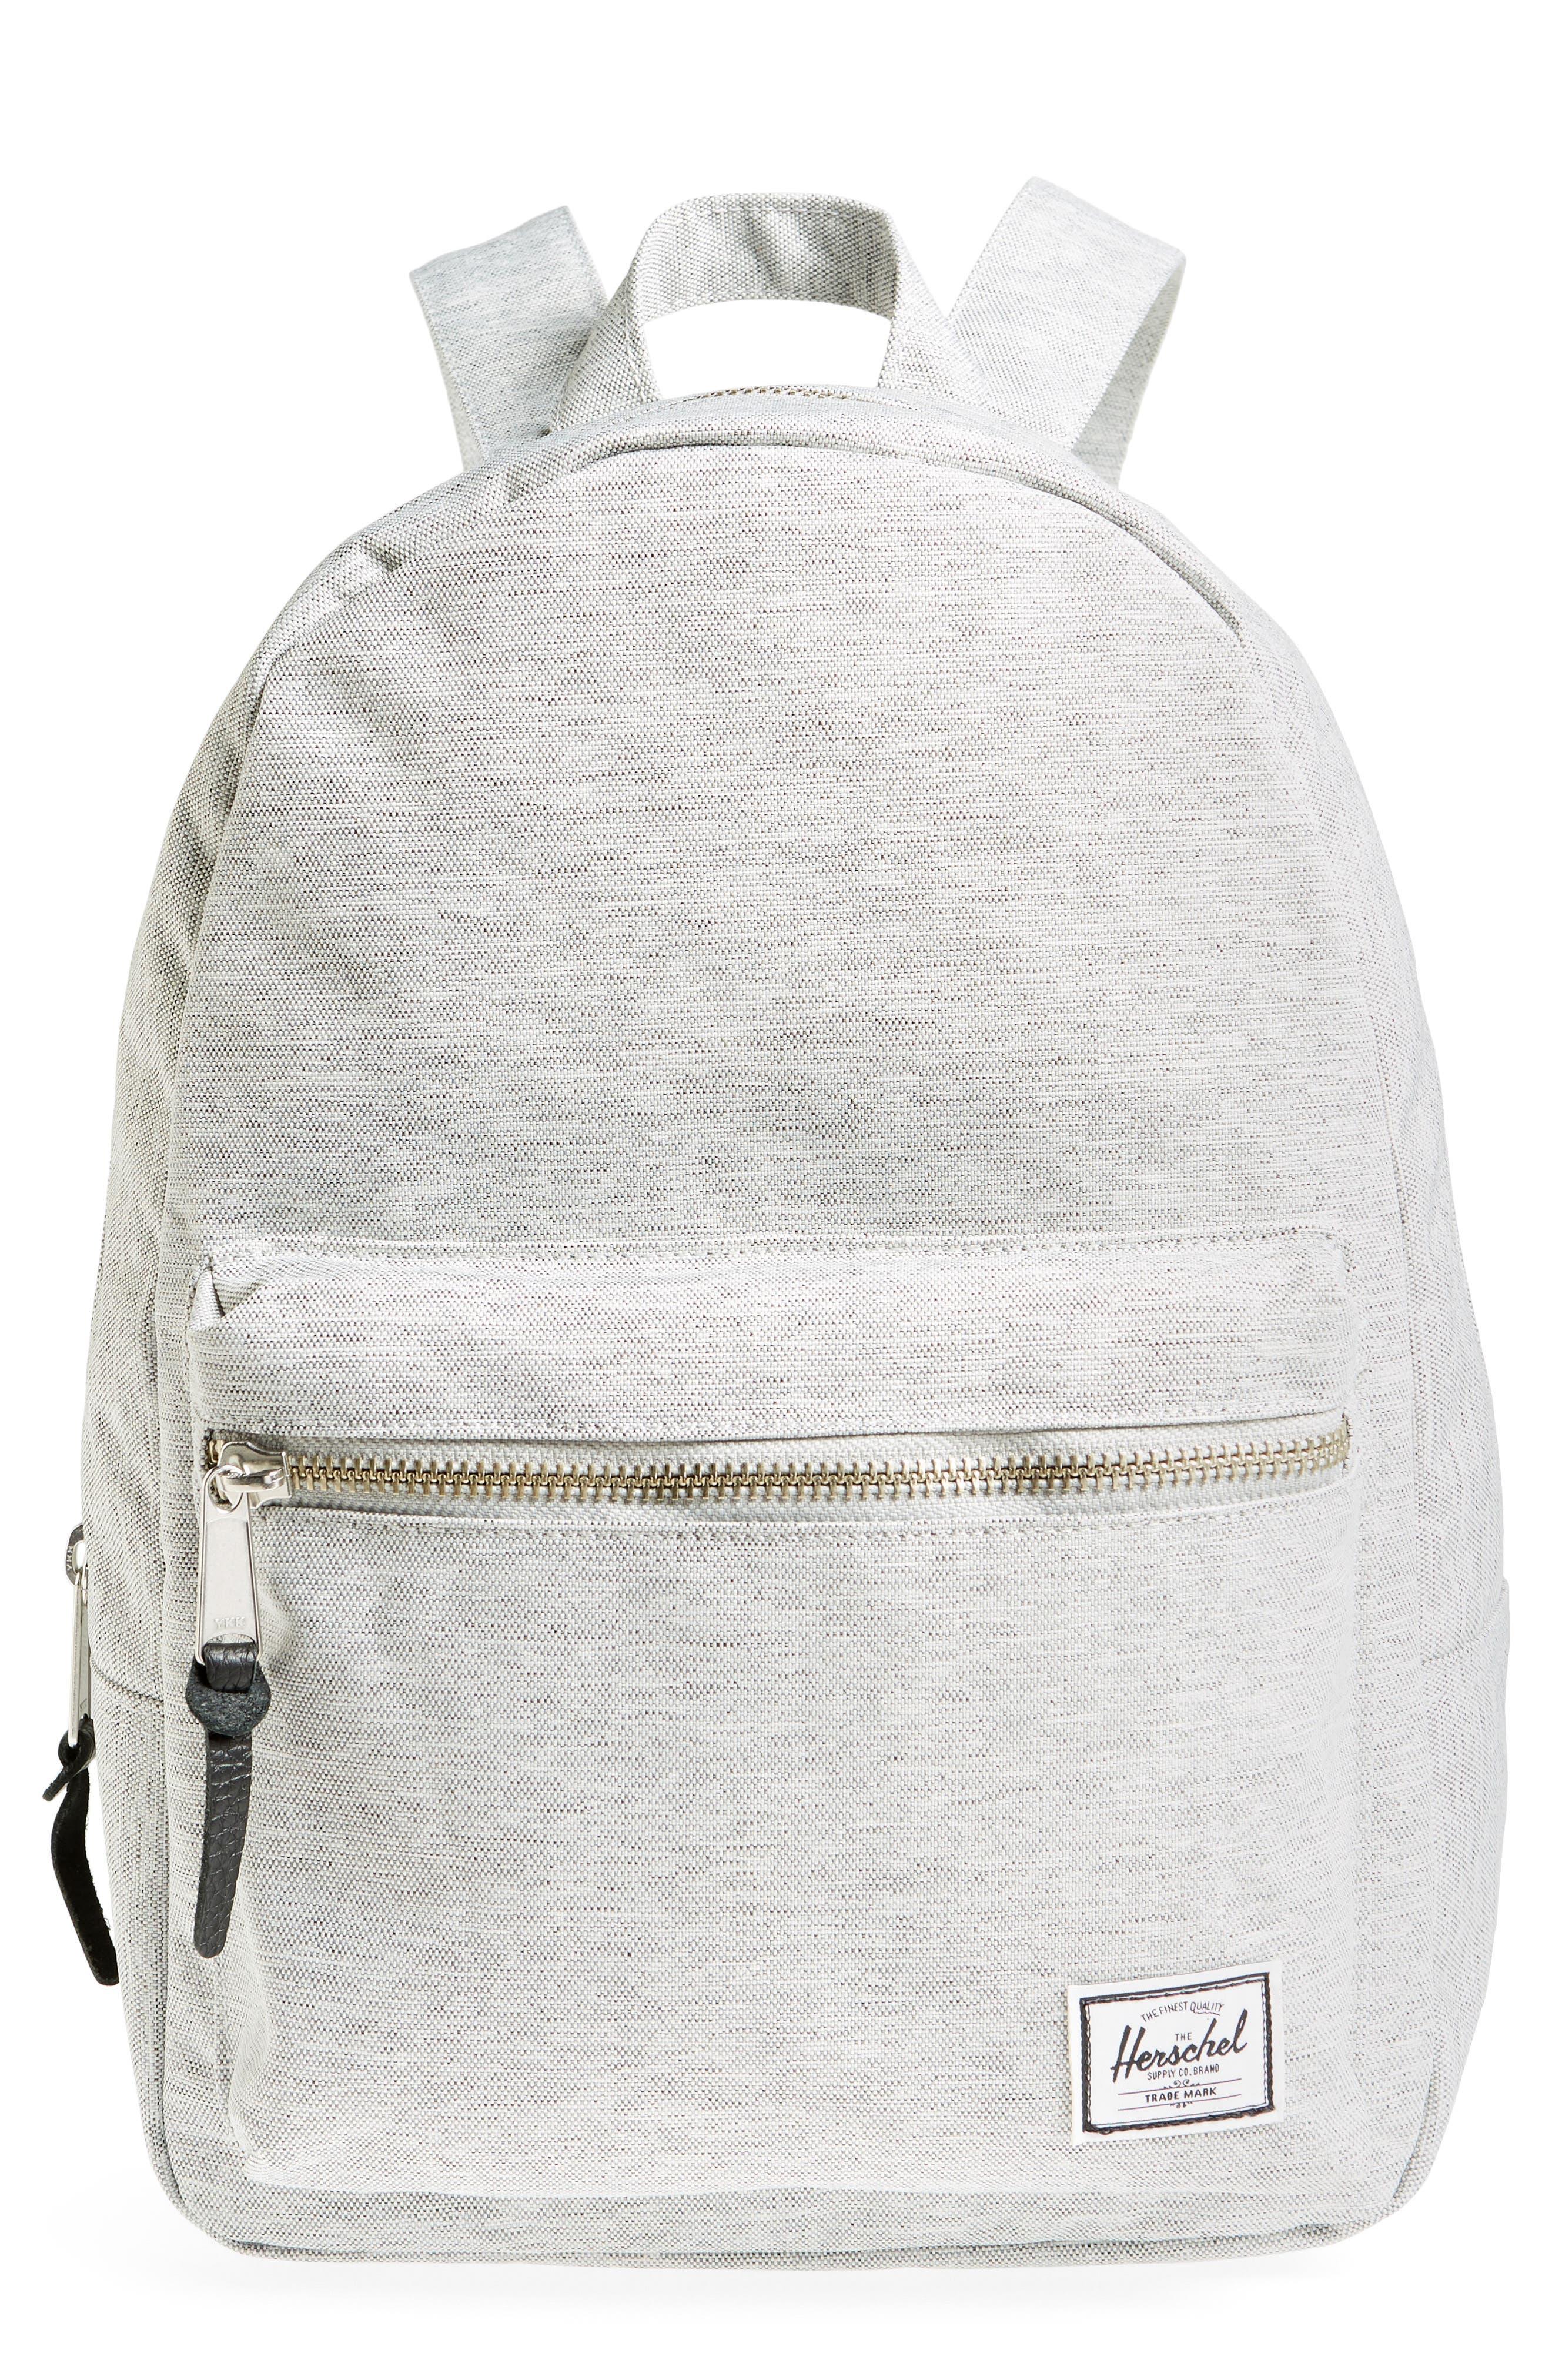 Grove Backpack,                         Main,                         color, LIGHT GREY CROSSHATCH